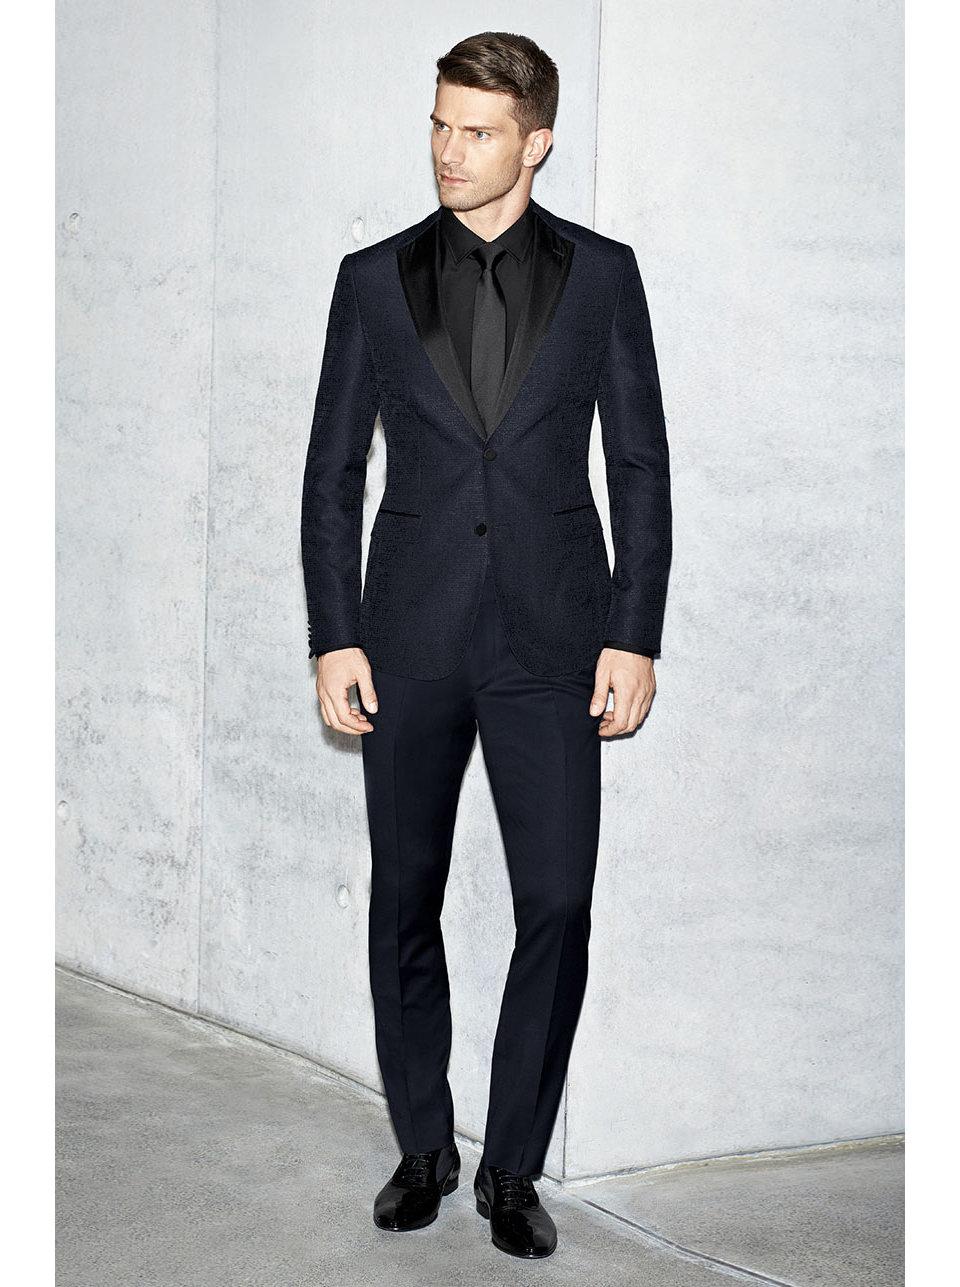 Dark blue tailored jacket, black shirt and black tie byBOSS